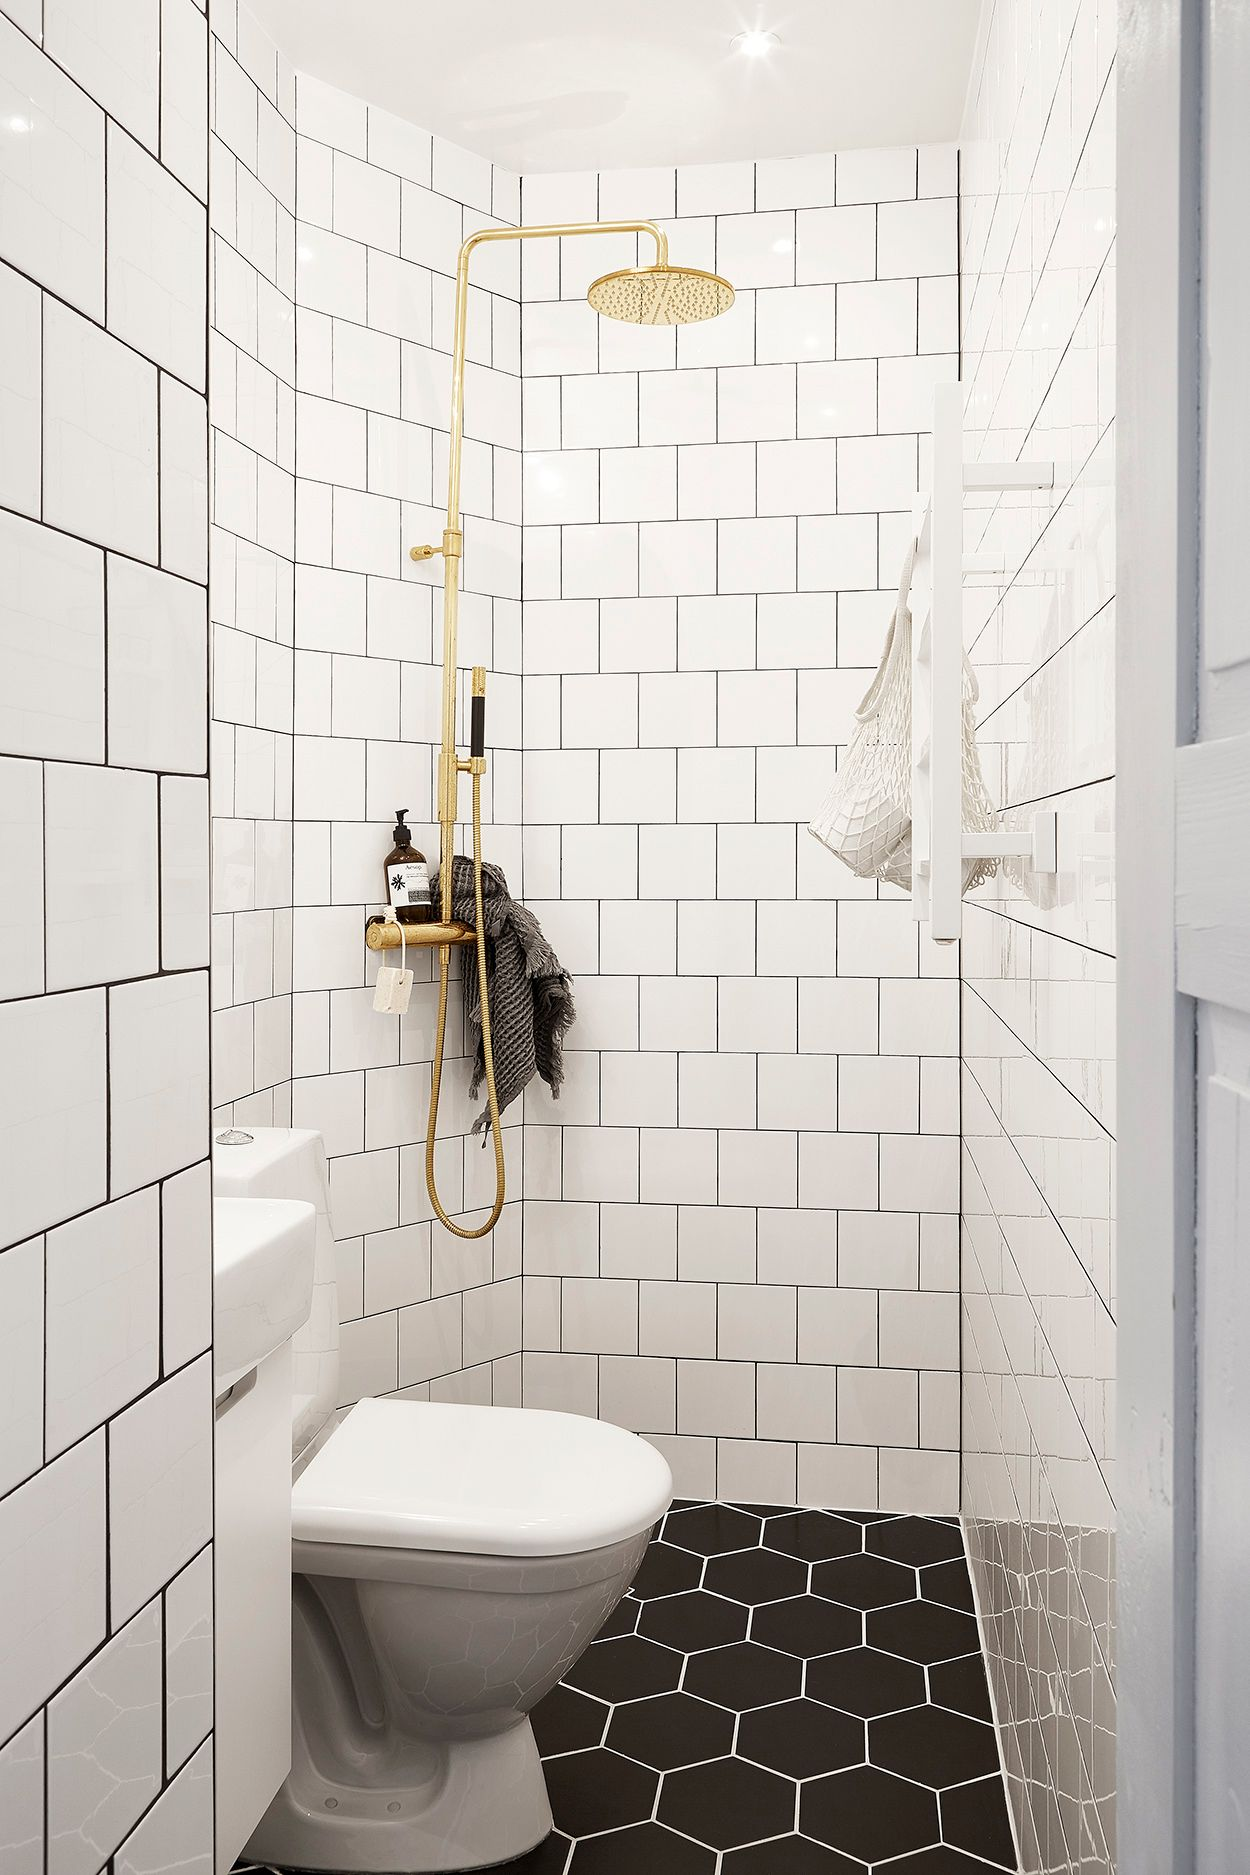 35 Small Bathroom Design Ideas - Small Bathroom Solutions on Simple Bathroom Designs For Small Spaces  id=88085